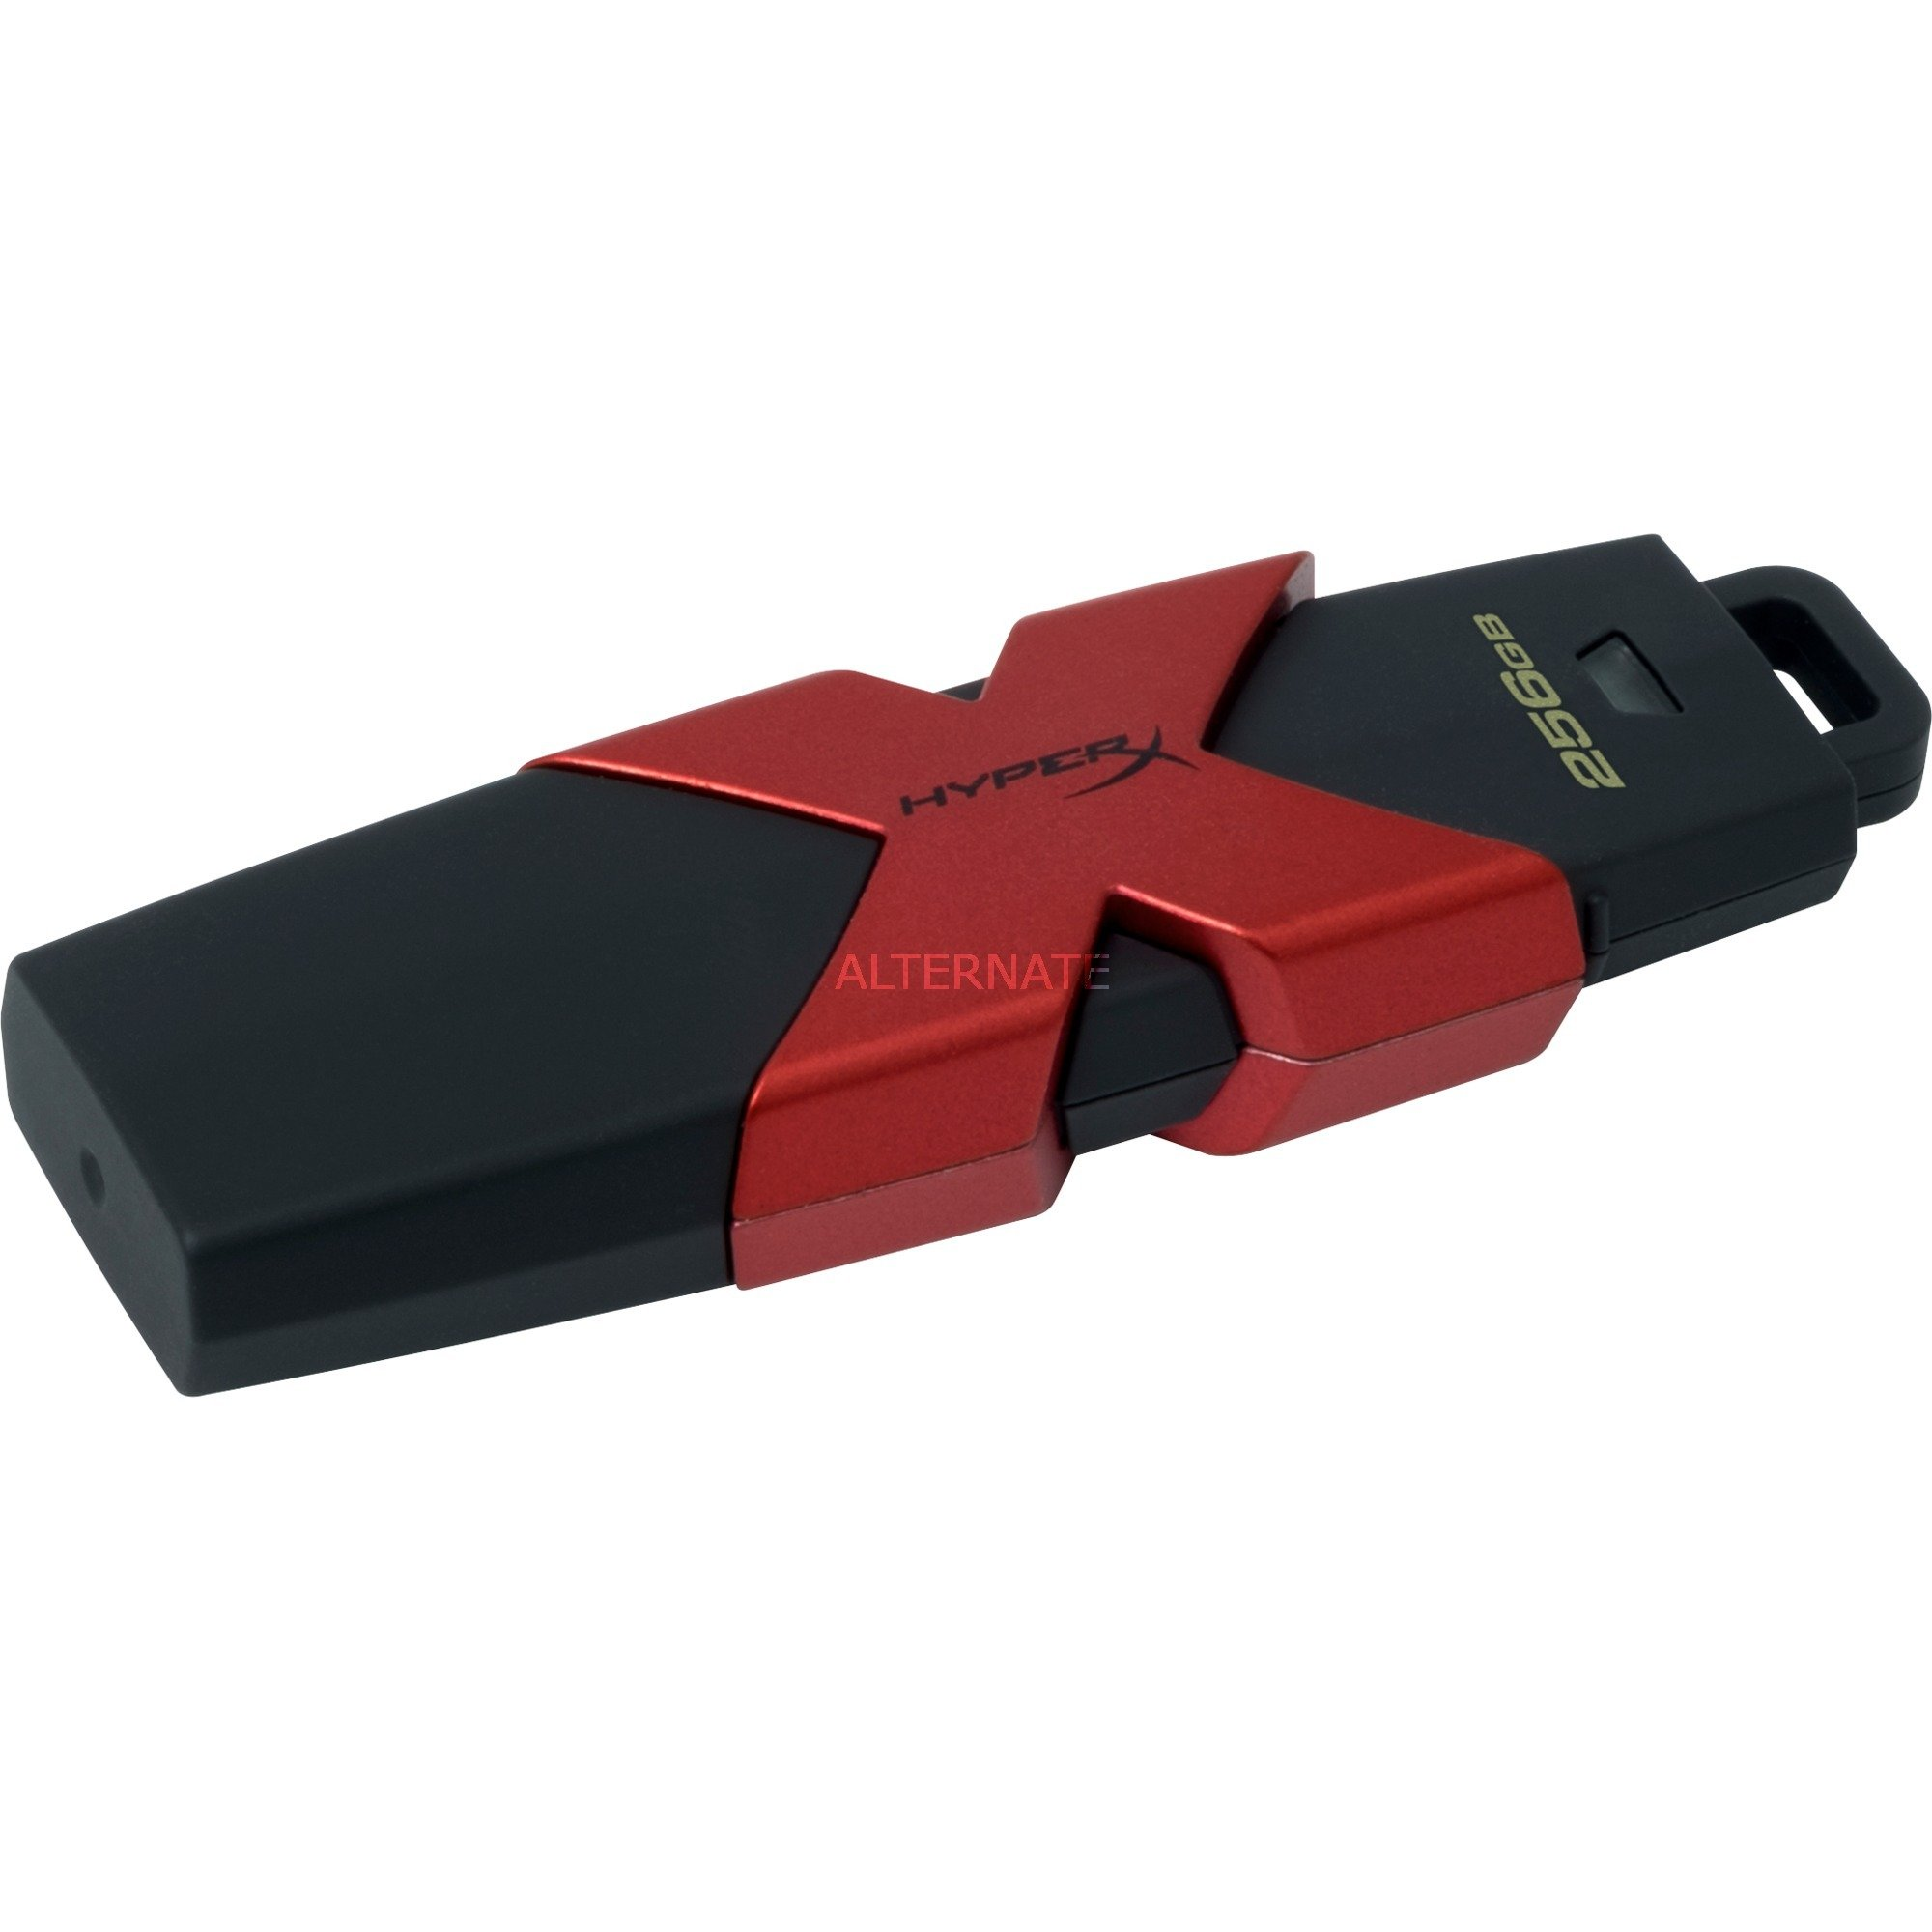 256GB 256GB USB 3.0 (3.1 Gen 1) Conector USB Tipo A Negro, Rojo unidad flash USB, Lápiz USB